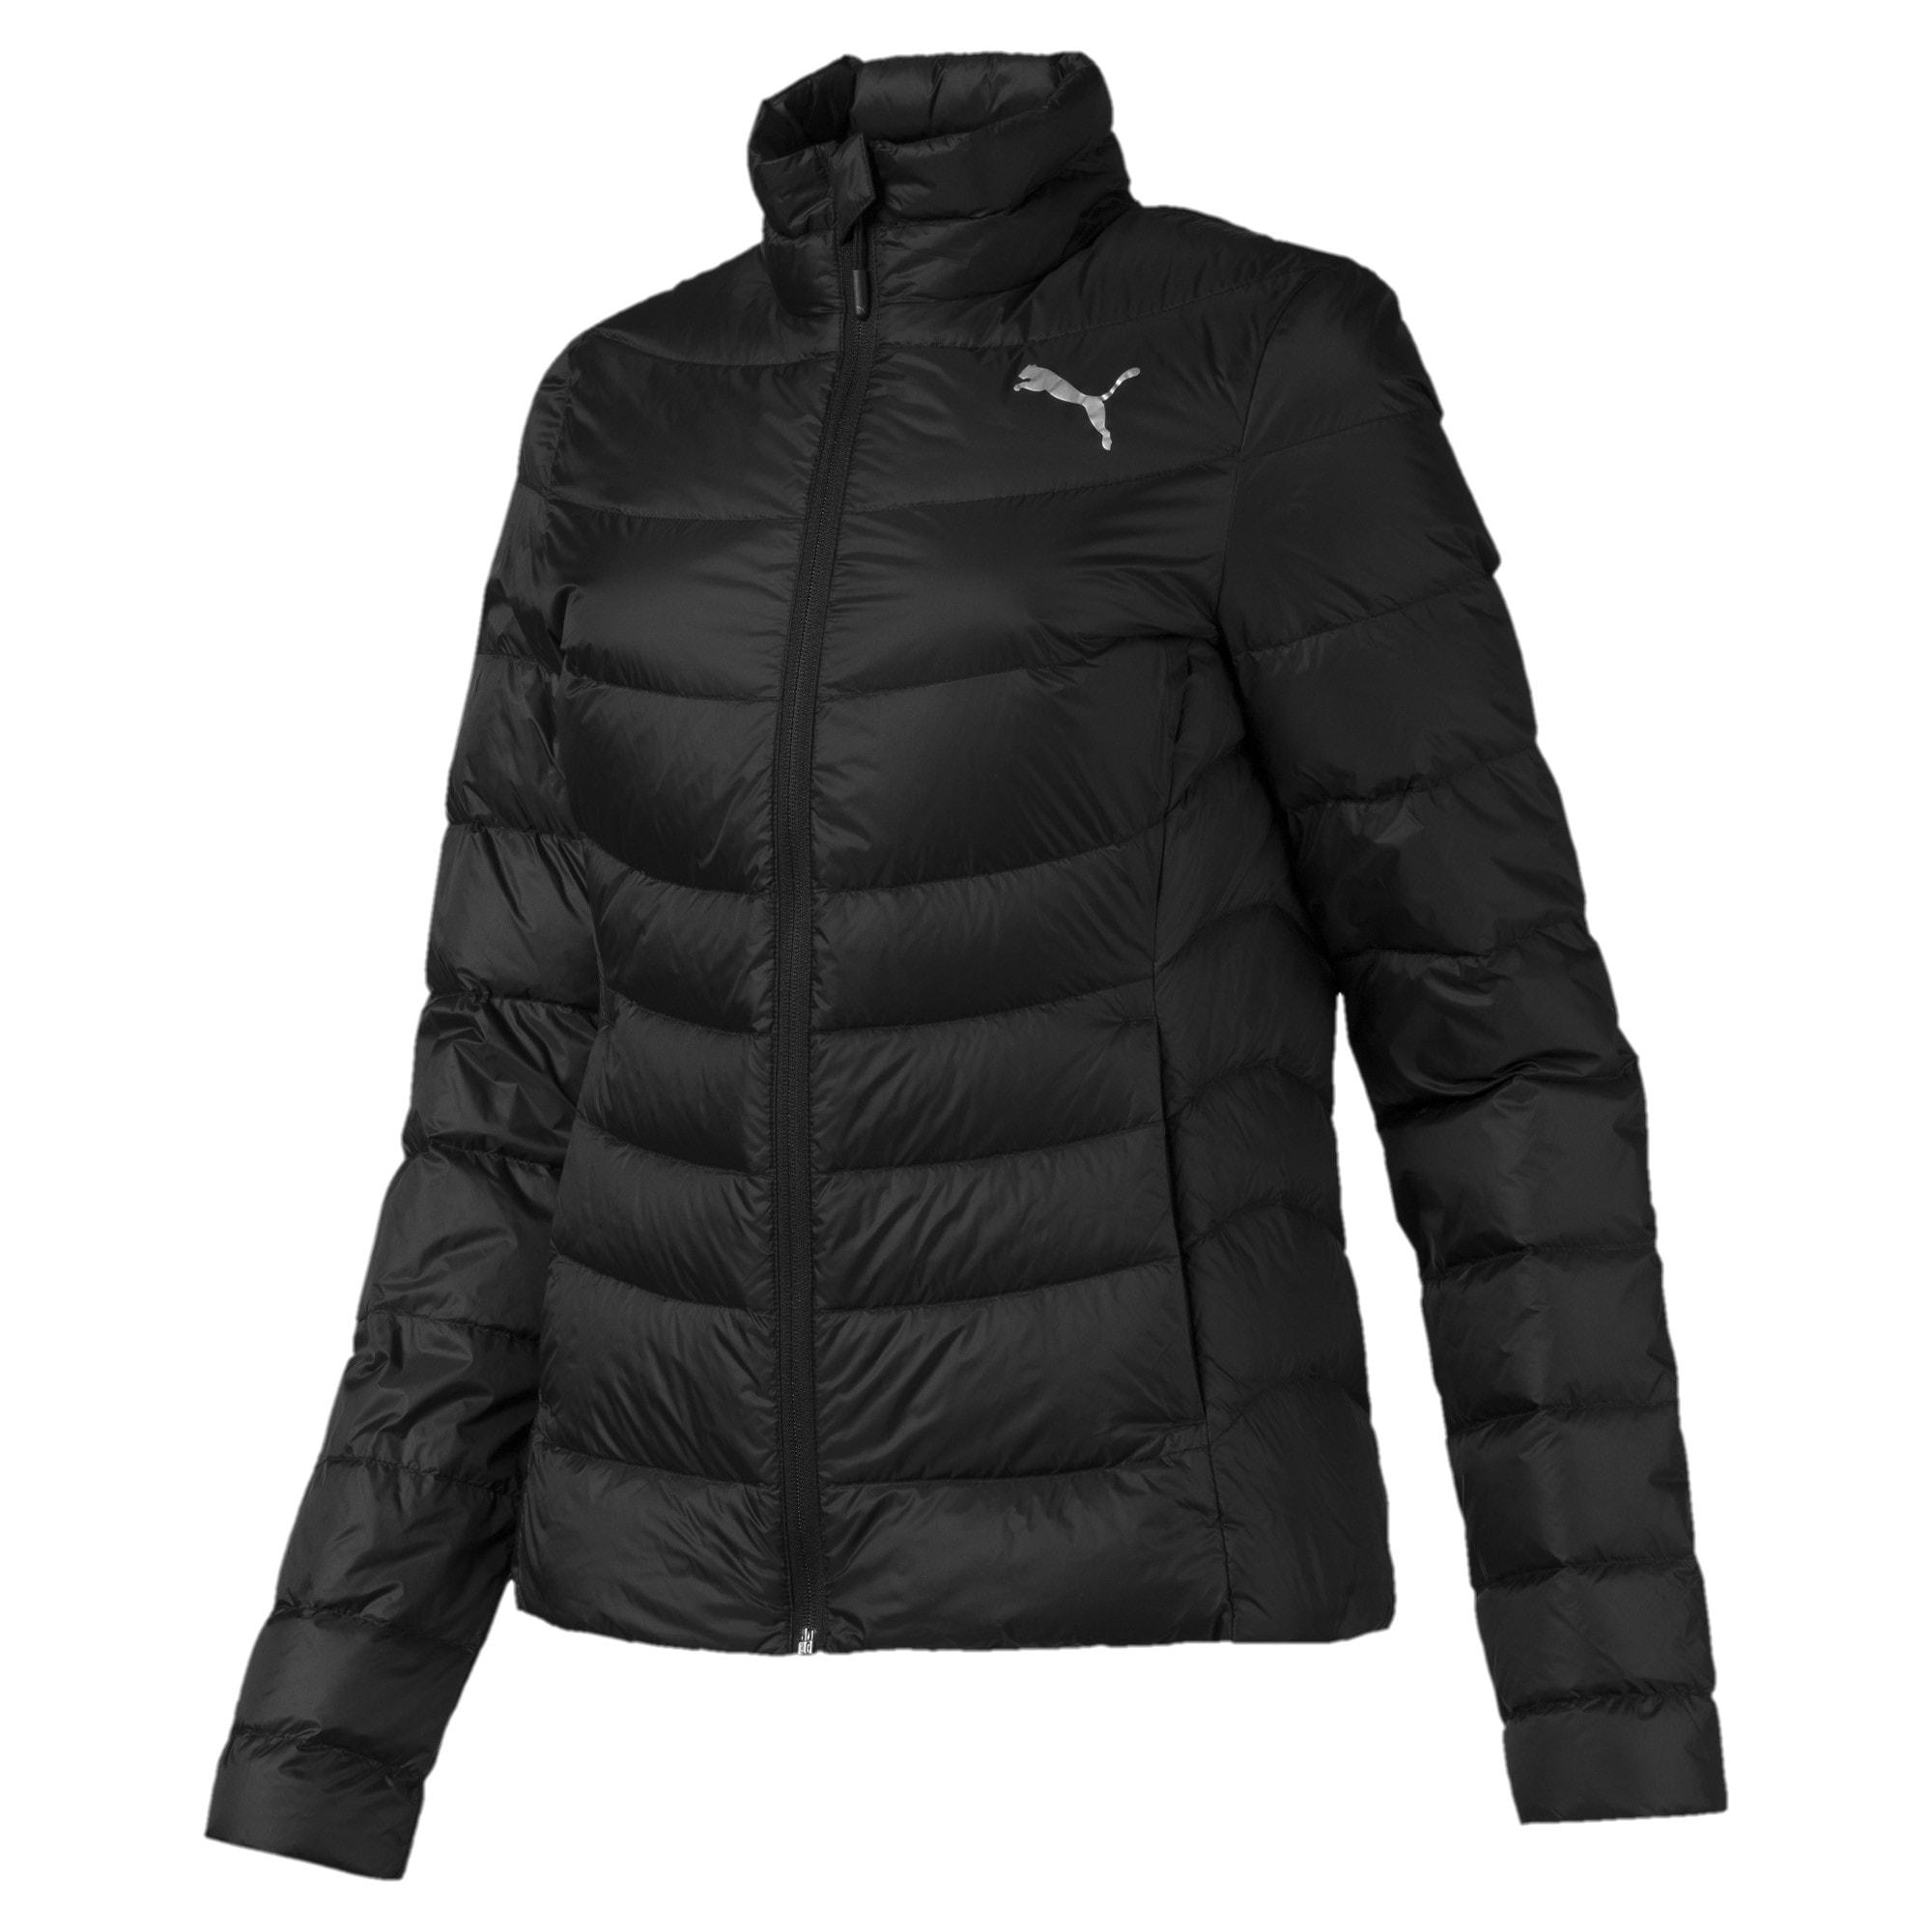 Thumbnail 4 of PWRWarm packLITE 600 Down Women's Jacket, Puma Black, medium